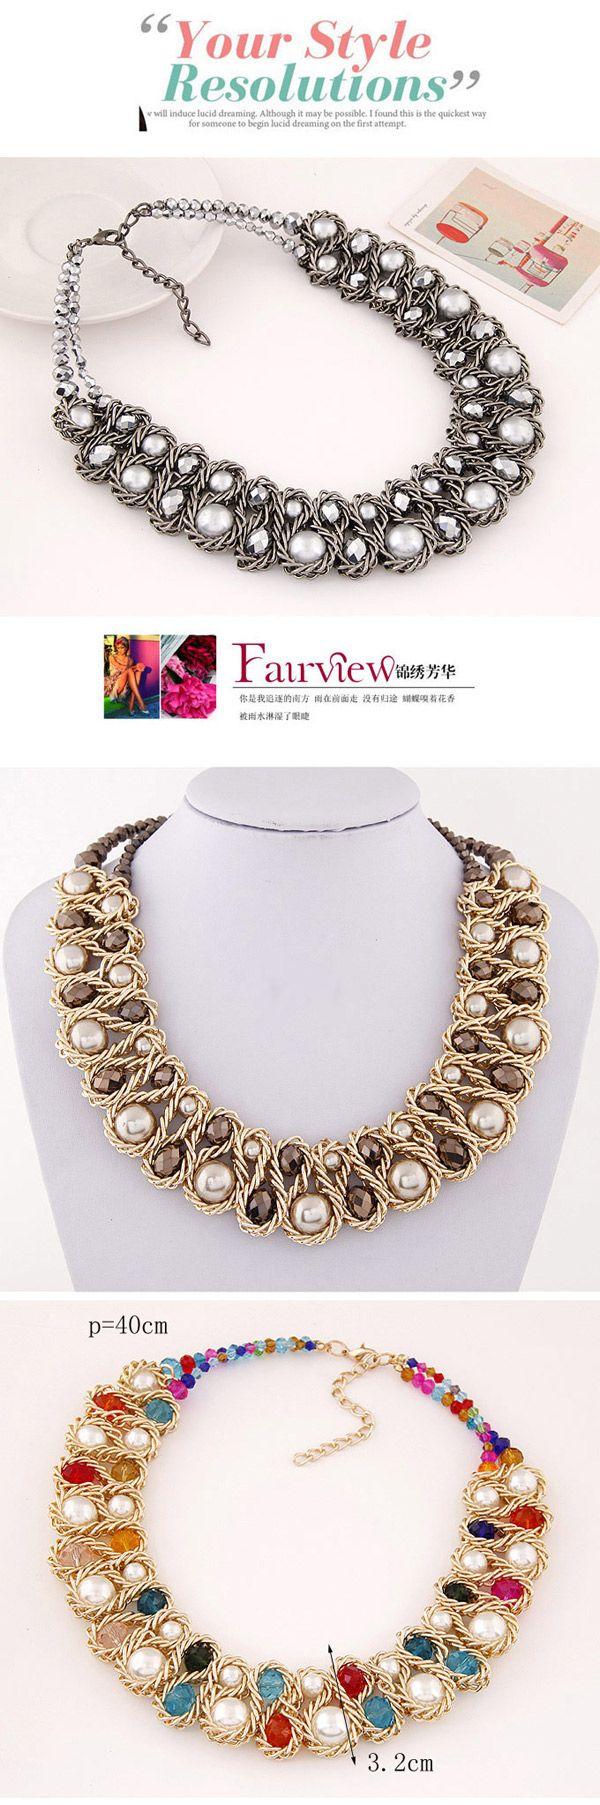 Luxurious White & Blue Beads Decorated Weave Design Alloy Bib Necklaces,Bib Necklaces